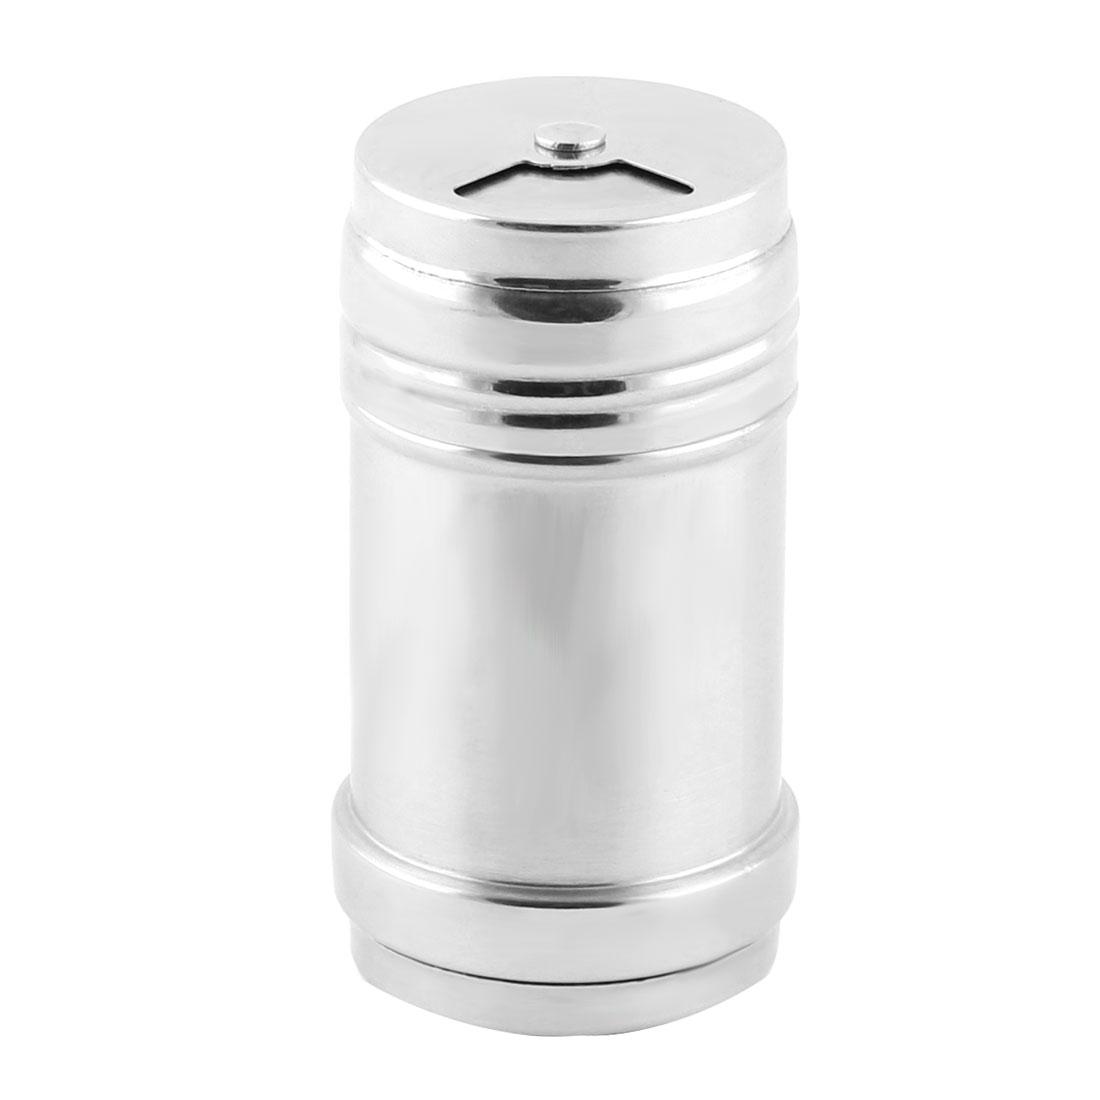 Kitchenware Metal Adjustable Rotating Spice Pepper Shaker Seasoning Can